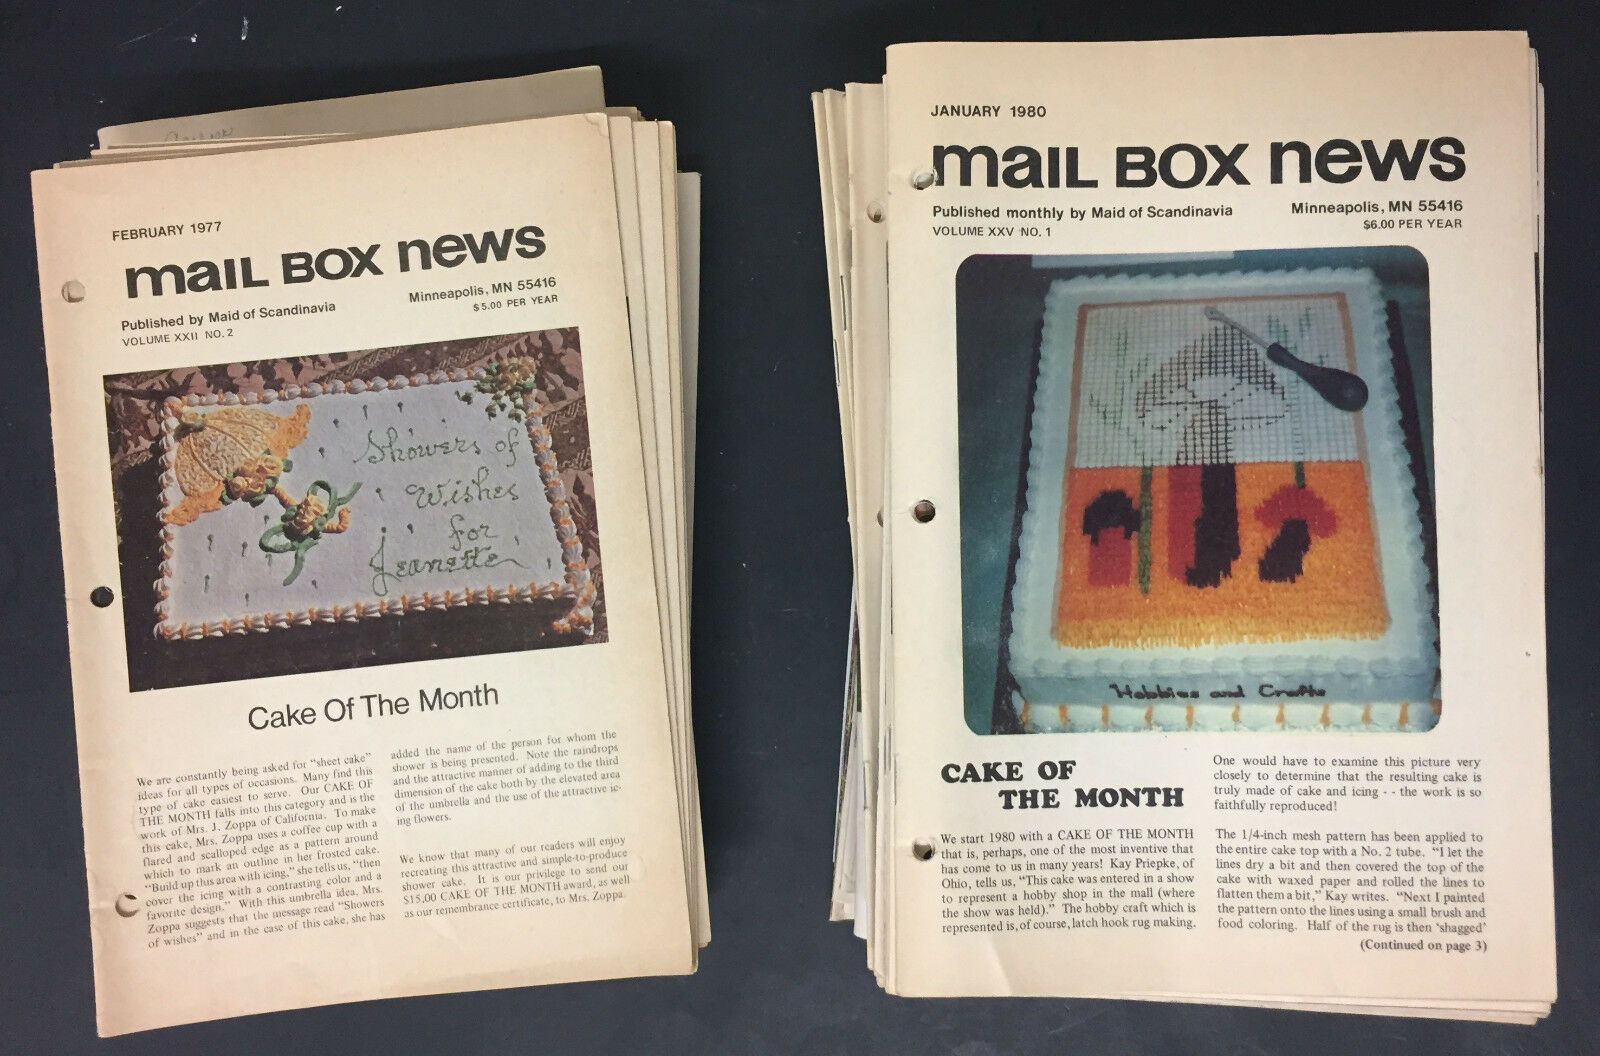 Lot of 80 Vtg Maid of Scandanvia Mail Box News cake decorating magazines